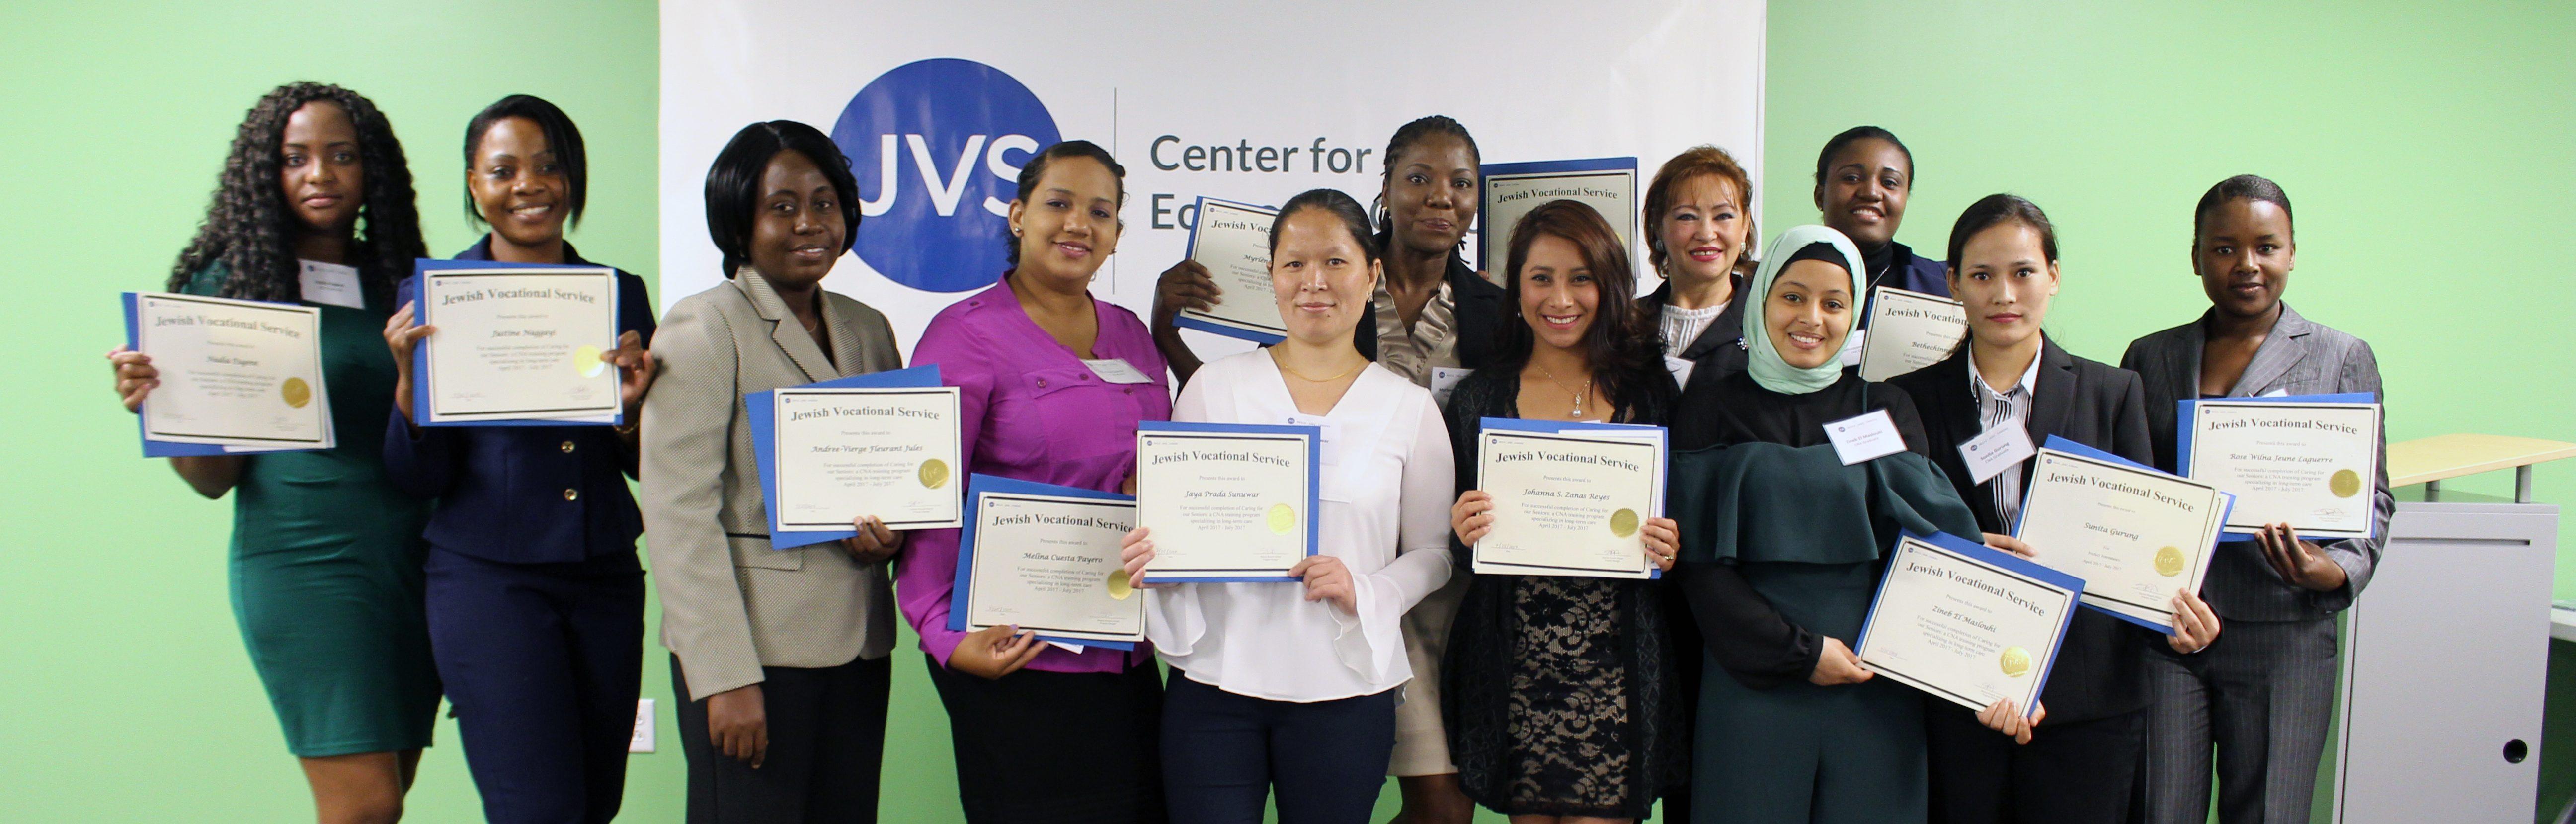 Cna Certification Program Tutore